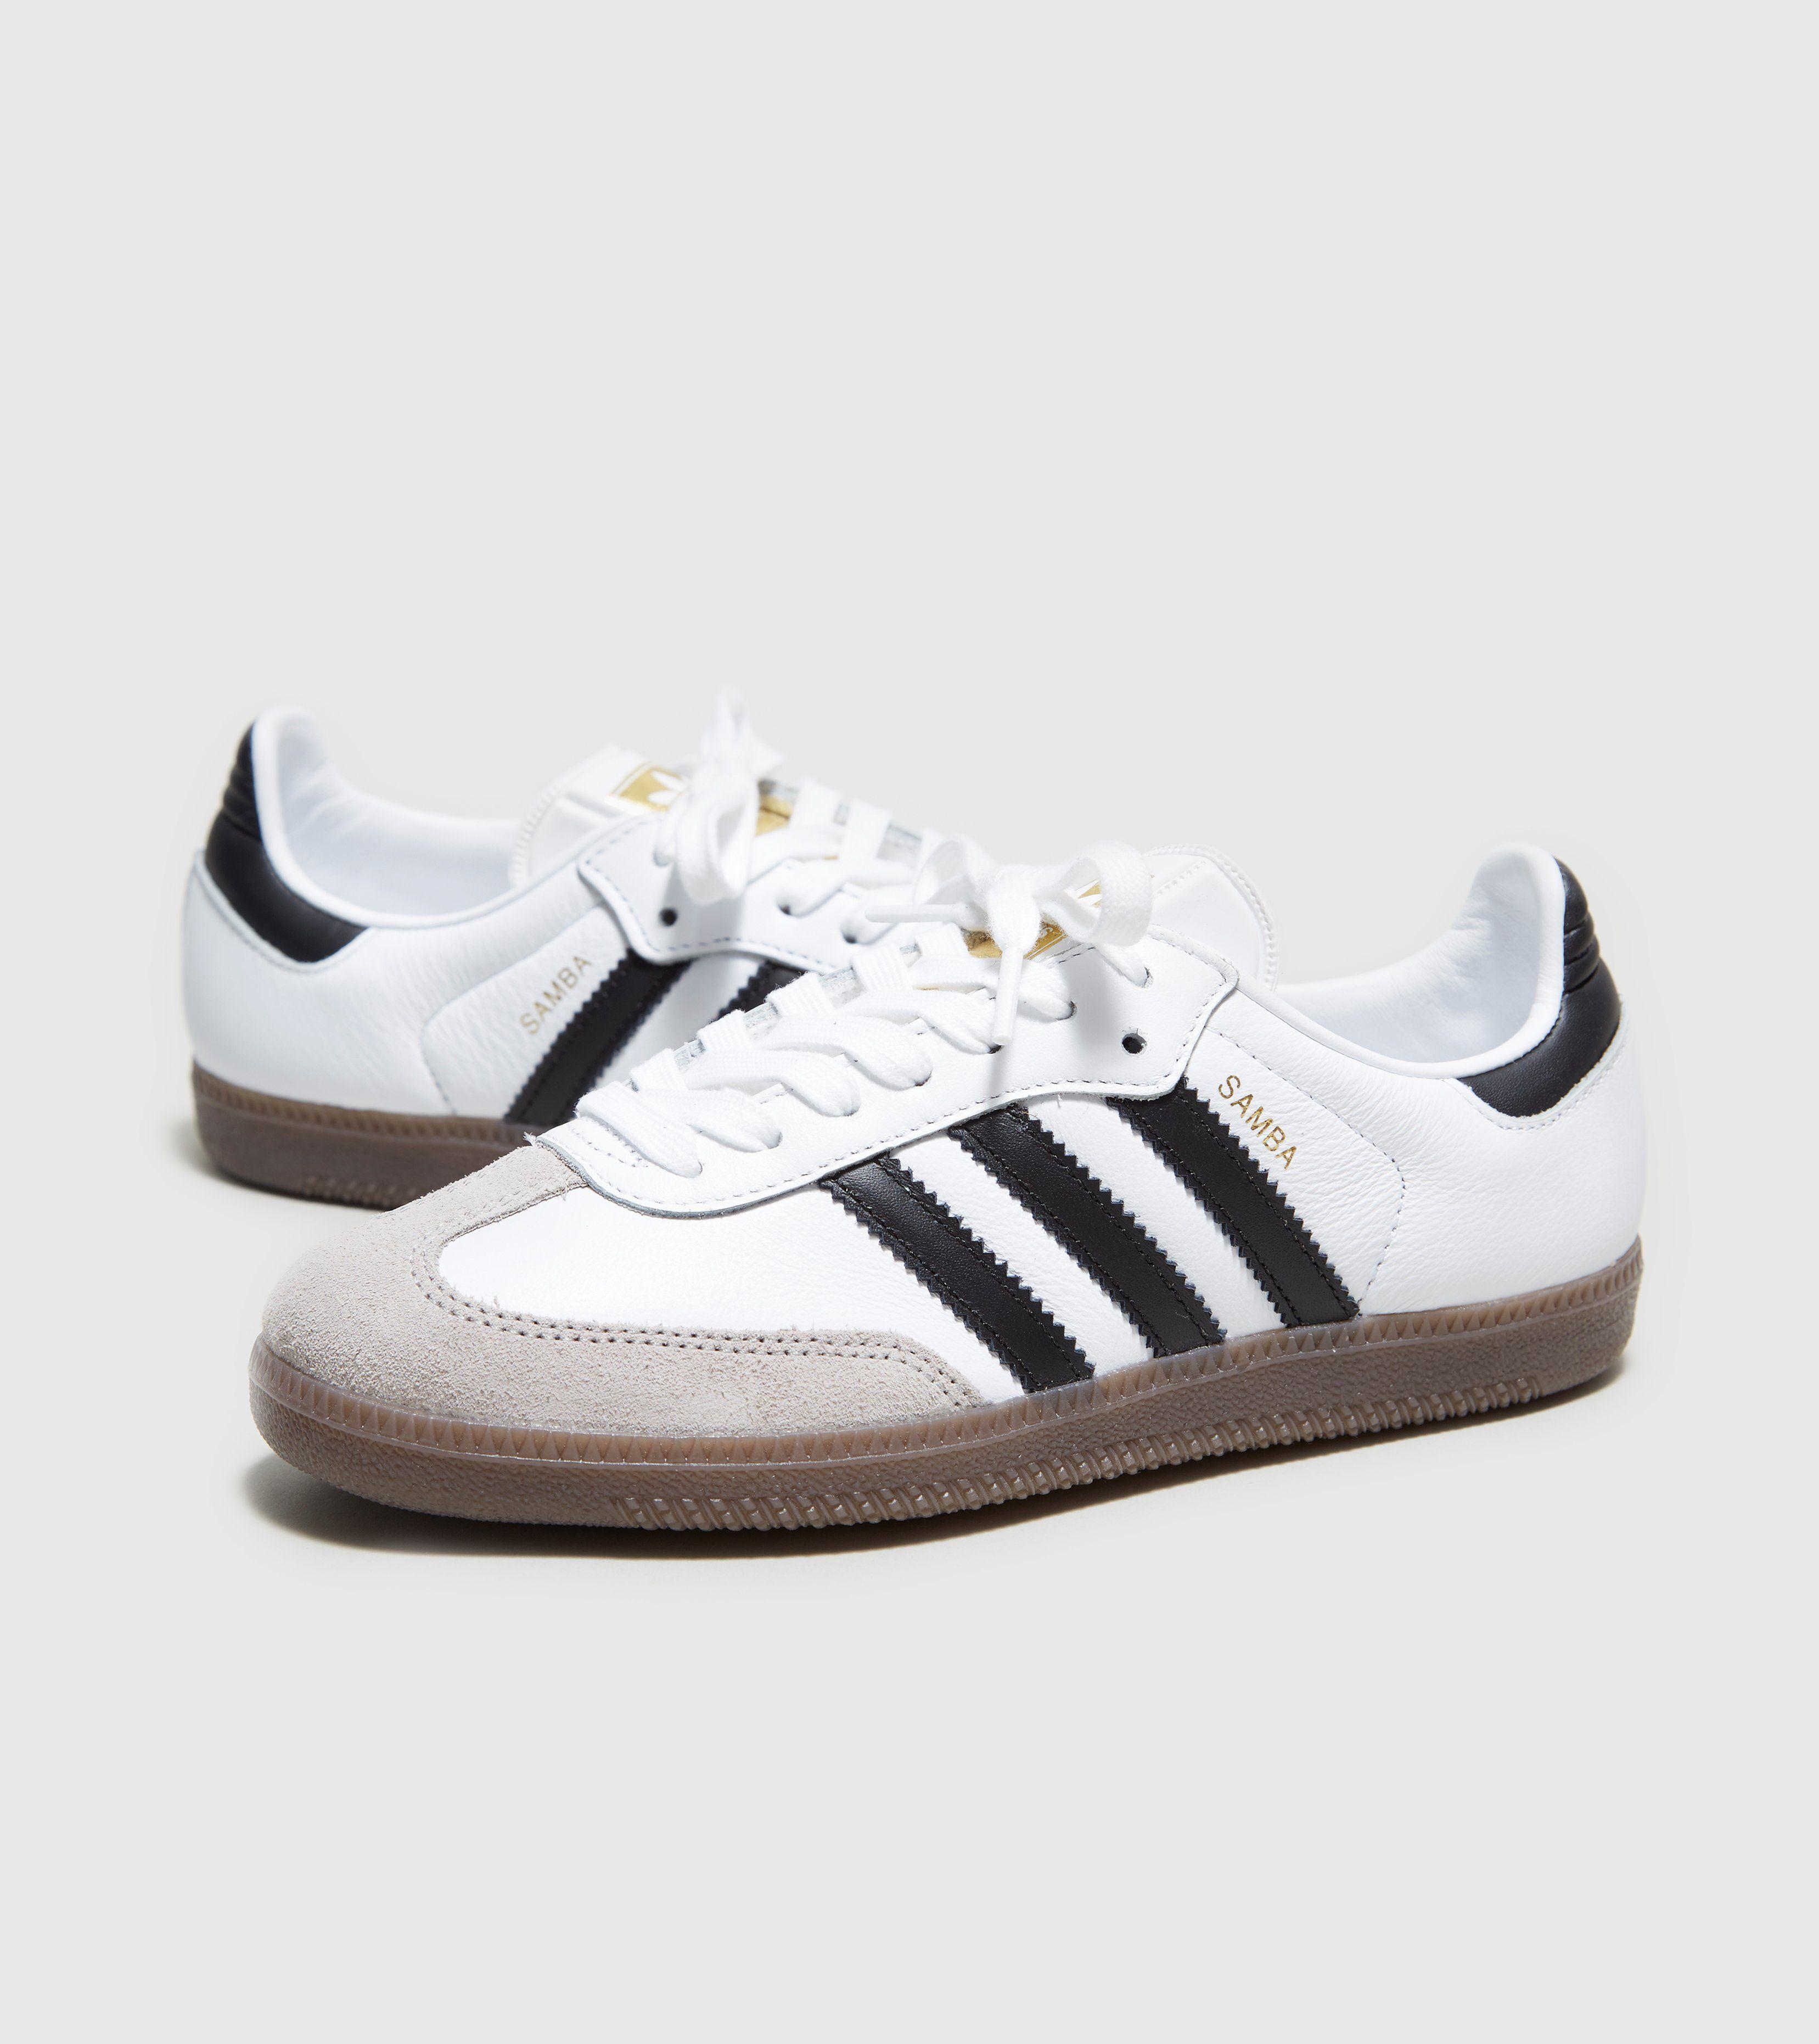 Adidas Originals Samba og mujeres es blanca adidas Originals Adidas